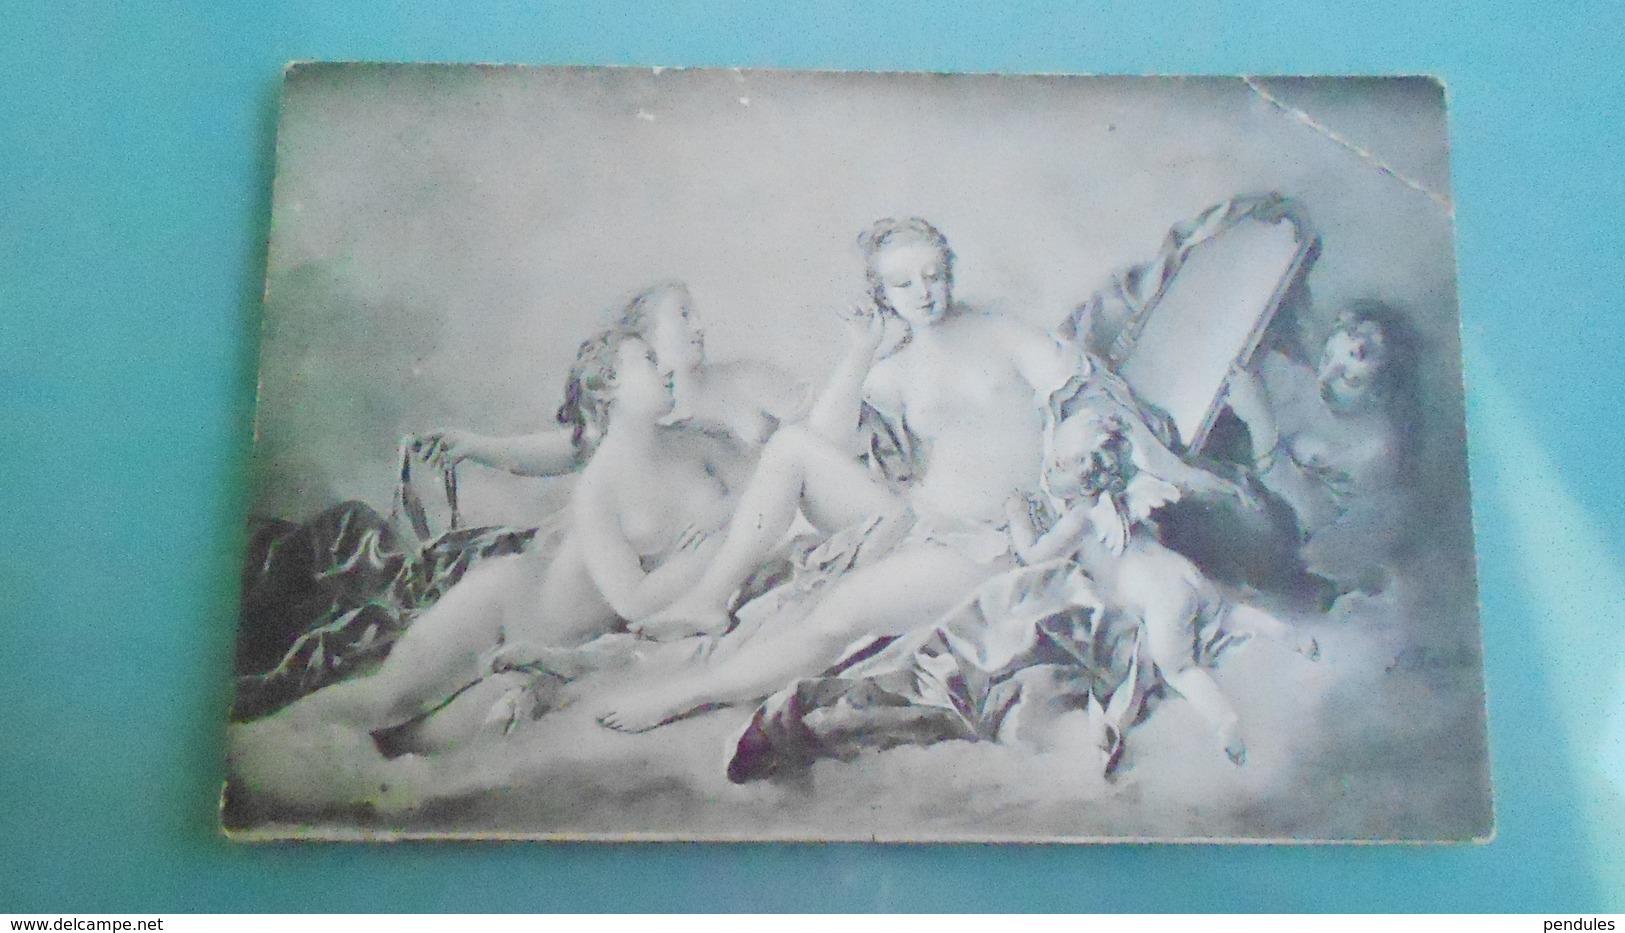 THCARTE DE THEMESN° DE CASIER 1276 OPLIURE - Femmes